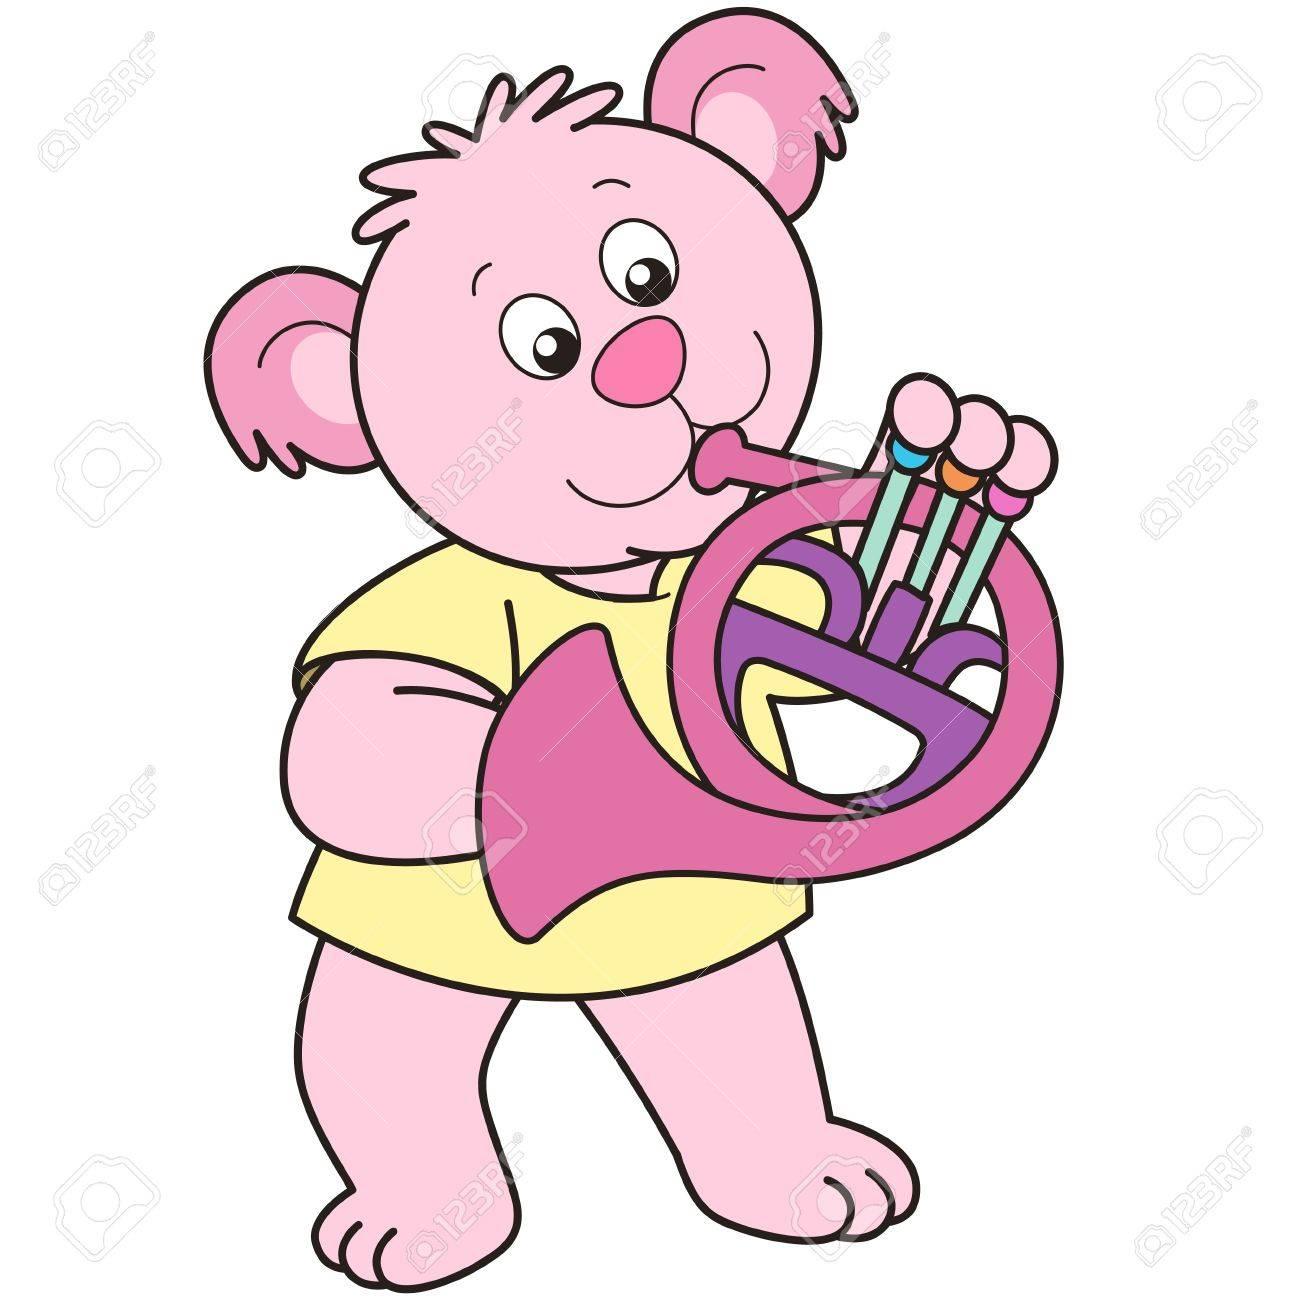 Cartoon Bear playing a French horn. Stock Vector - 18589291